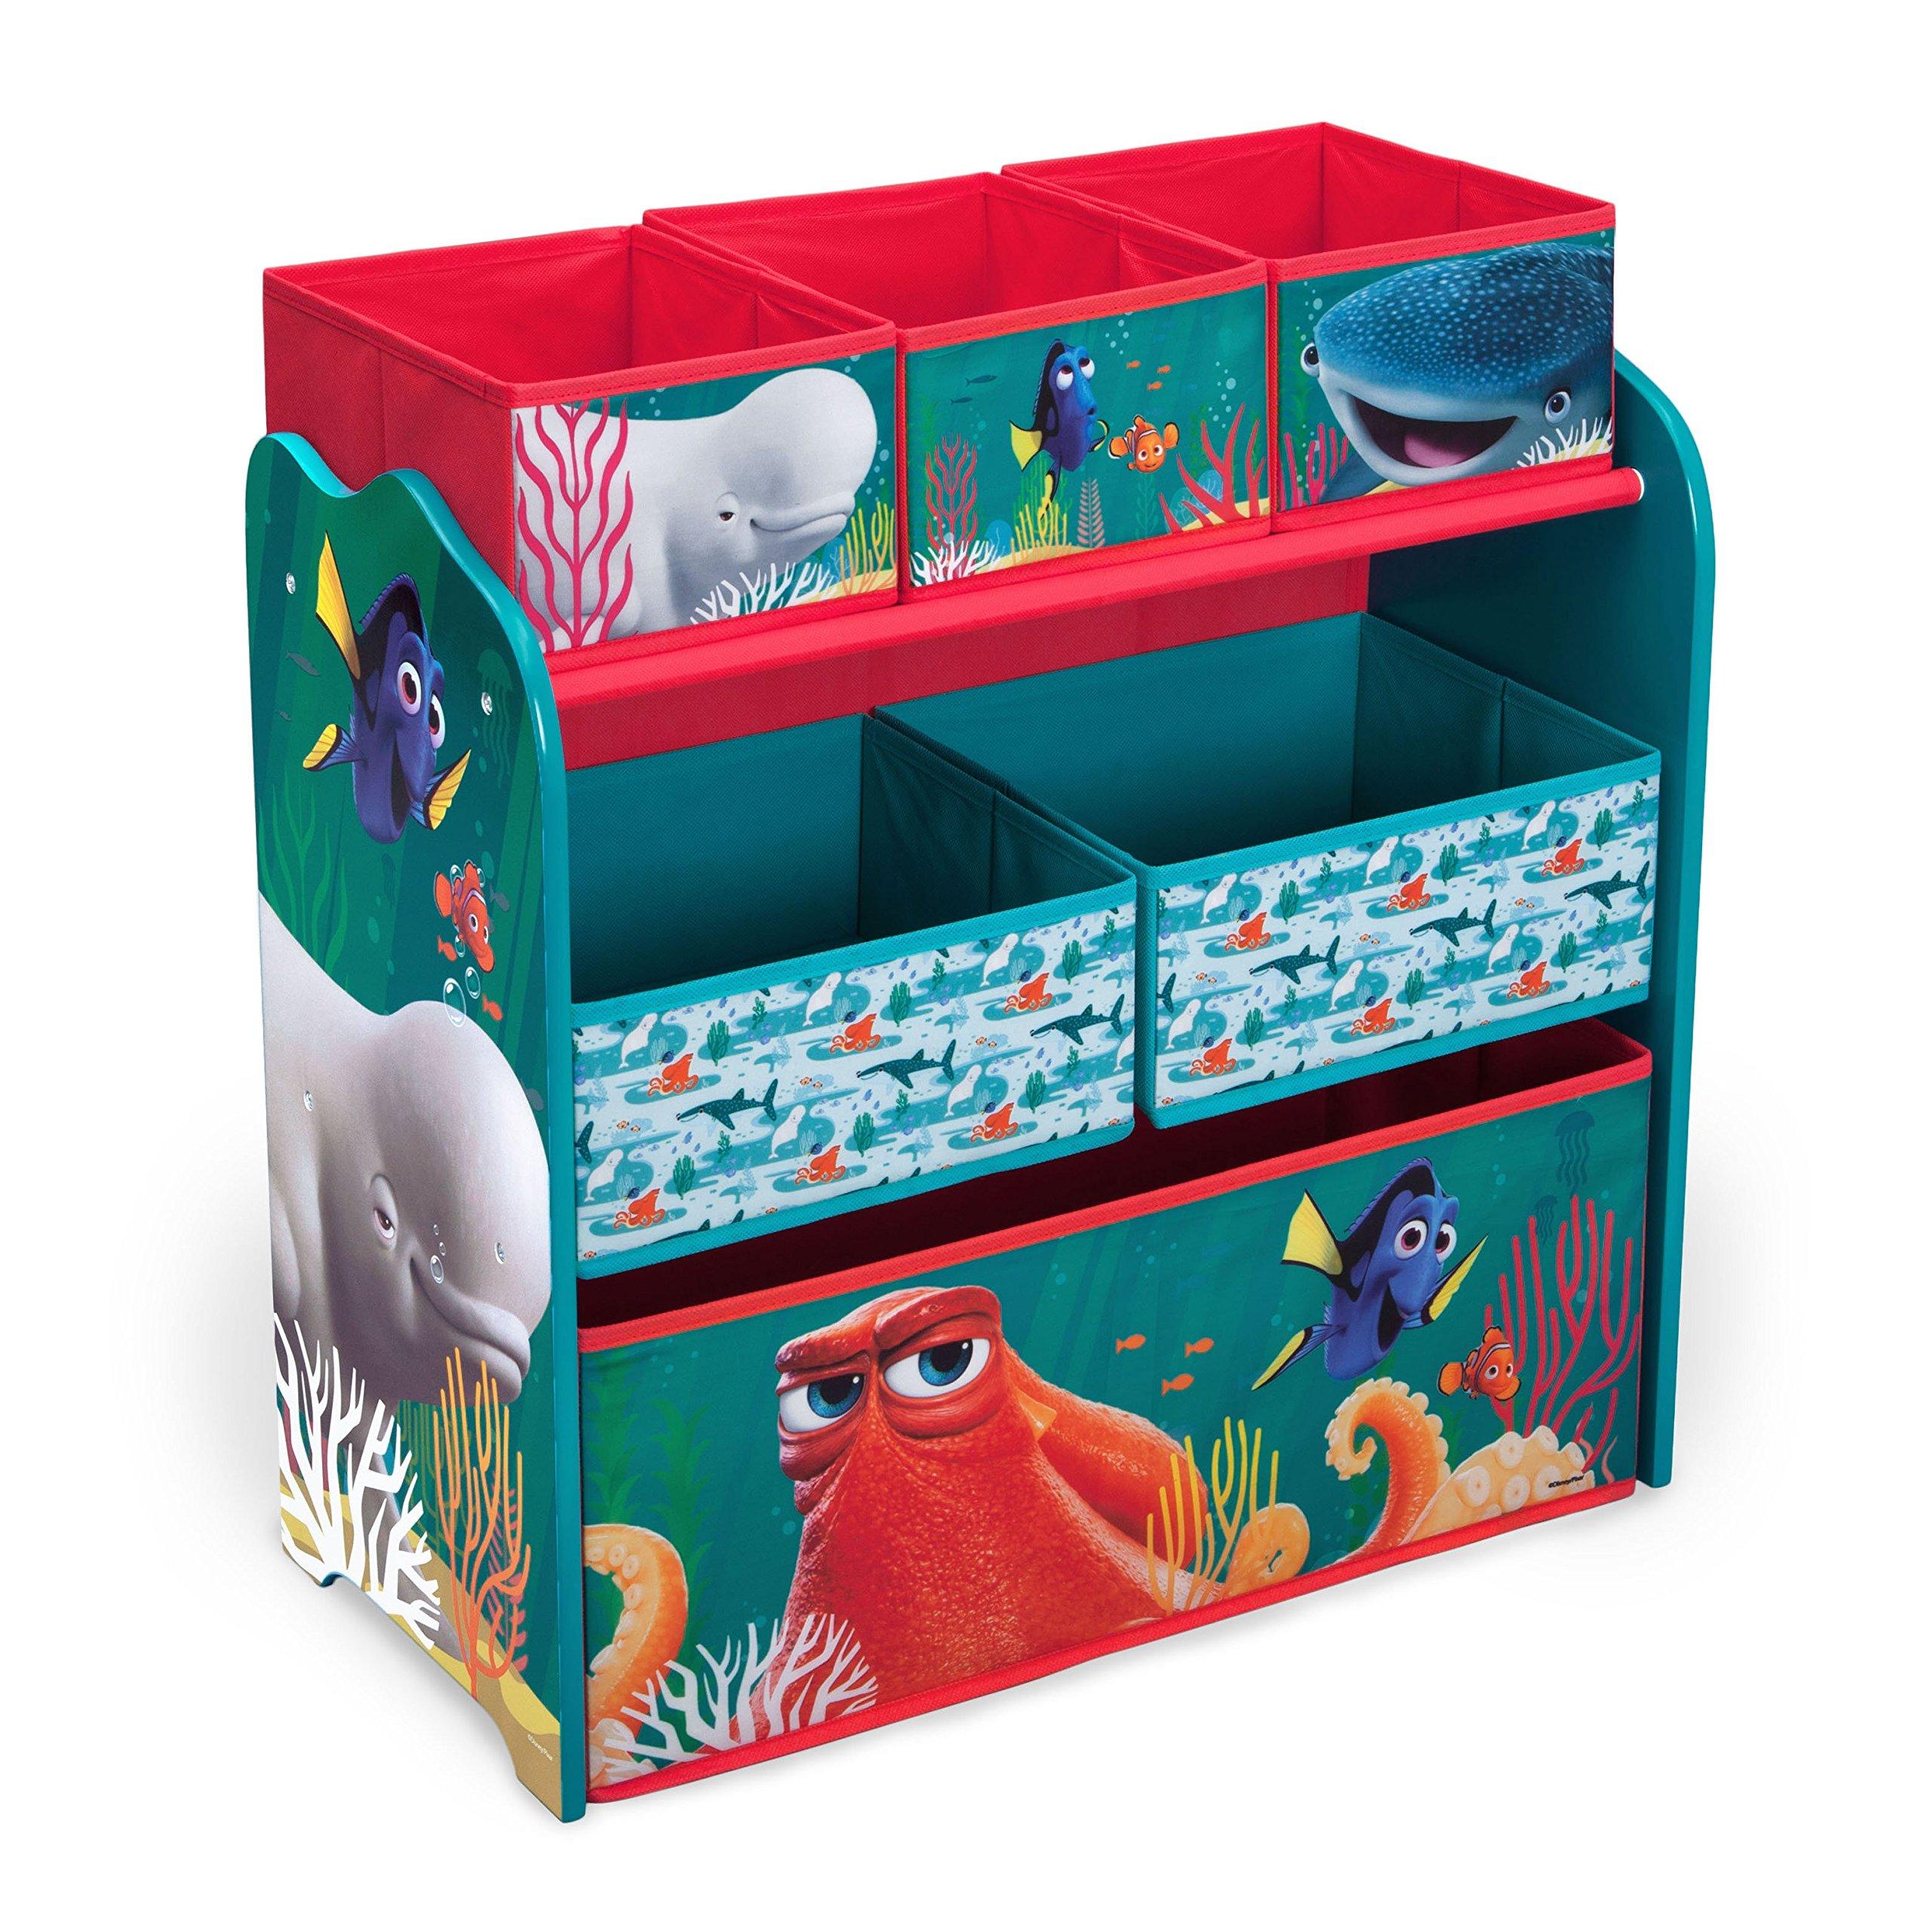 disney pixar 39 s finding dory octopus shade. Black Bedroom Furniture Sets. Home Design Ideas